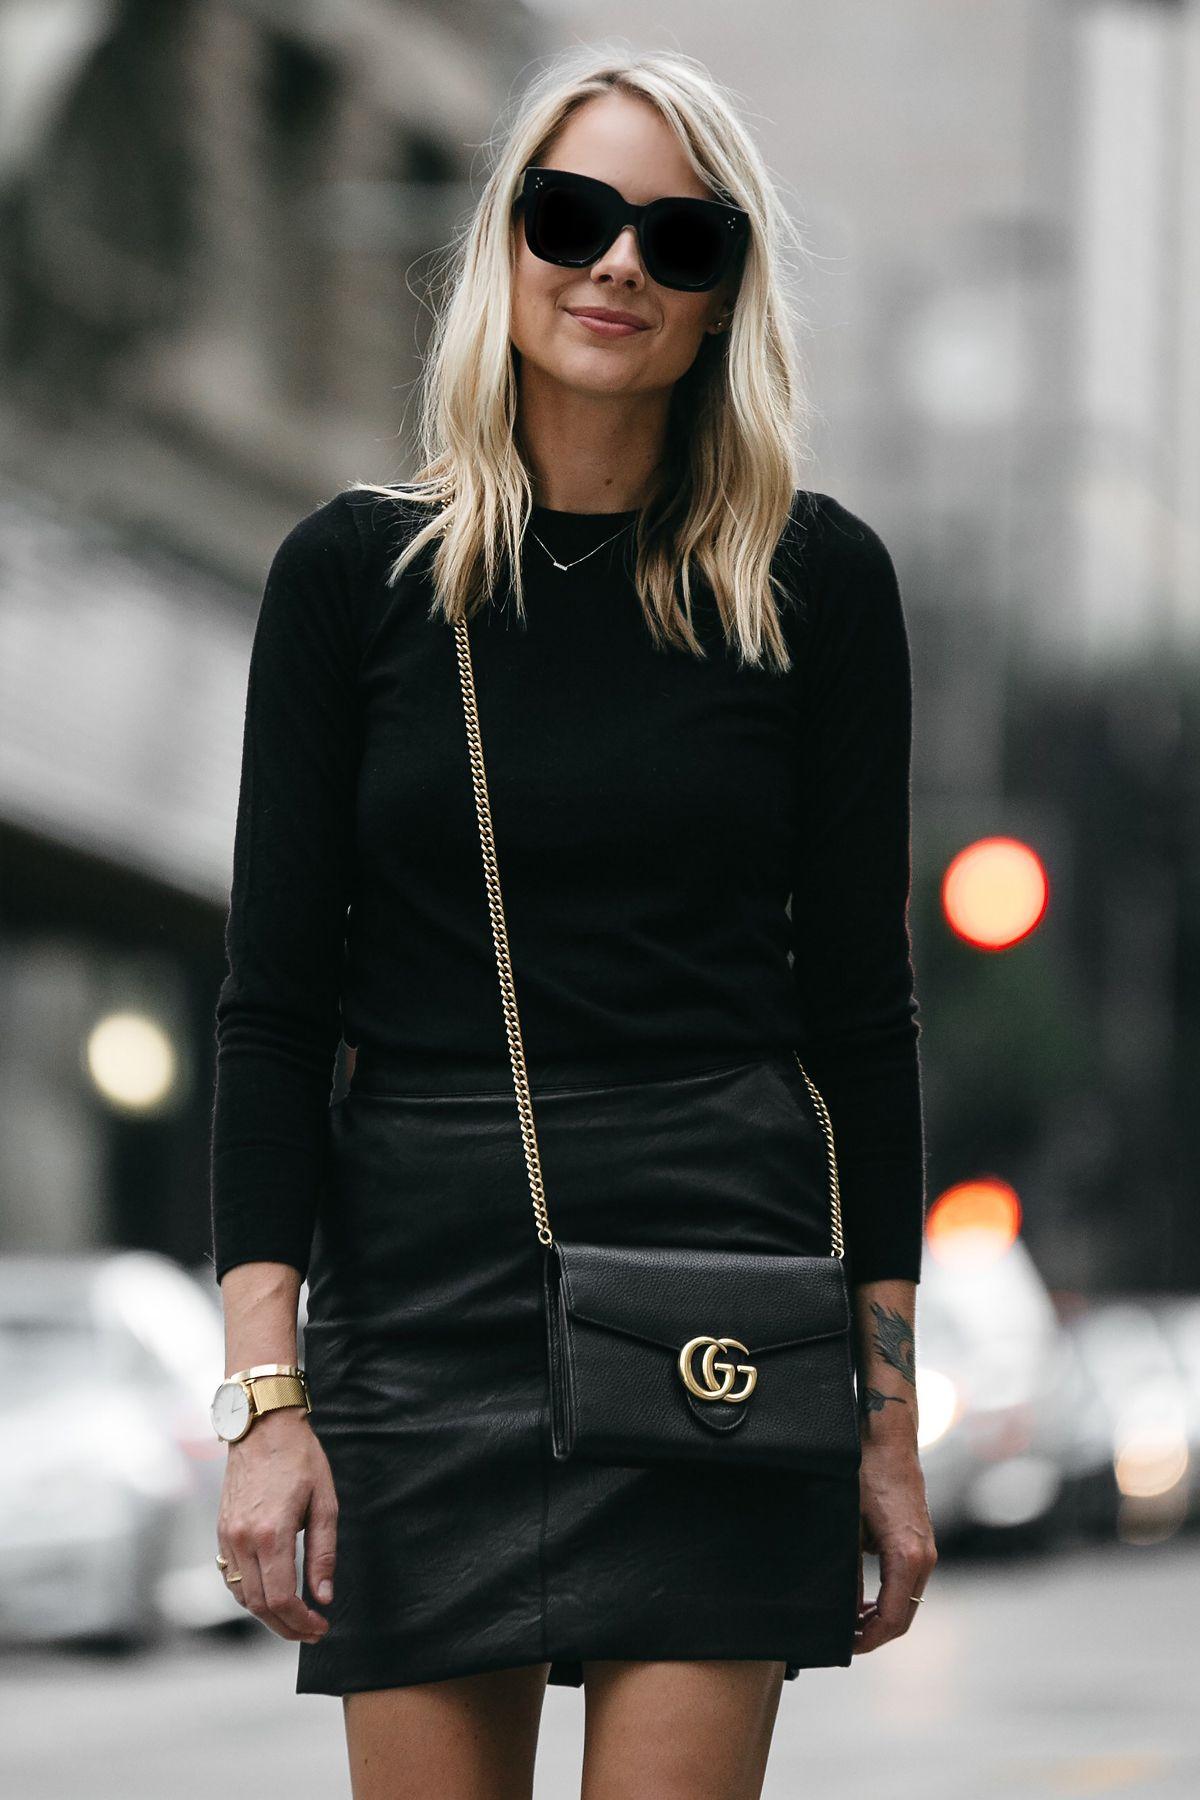 Blonde Woman Wearing Club Monaco Black Sweater Topshop Black Leather Mini  Skirt Outfit Gucci Marmont Handbag Fashion Jackson Dallas Blogger Fashion  Blogger ... 37f918e53